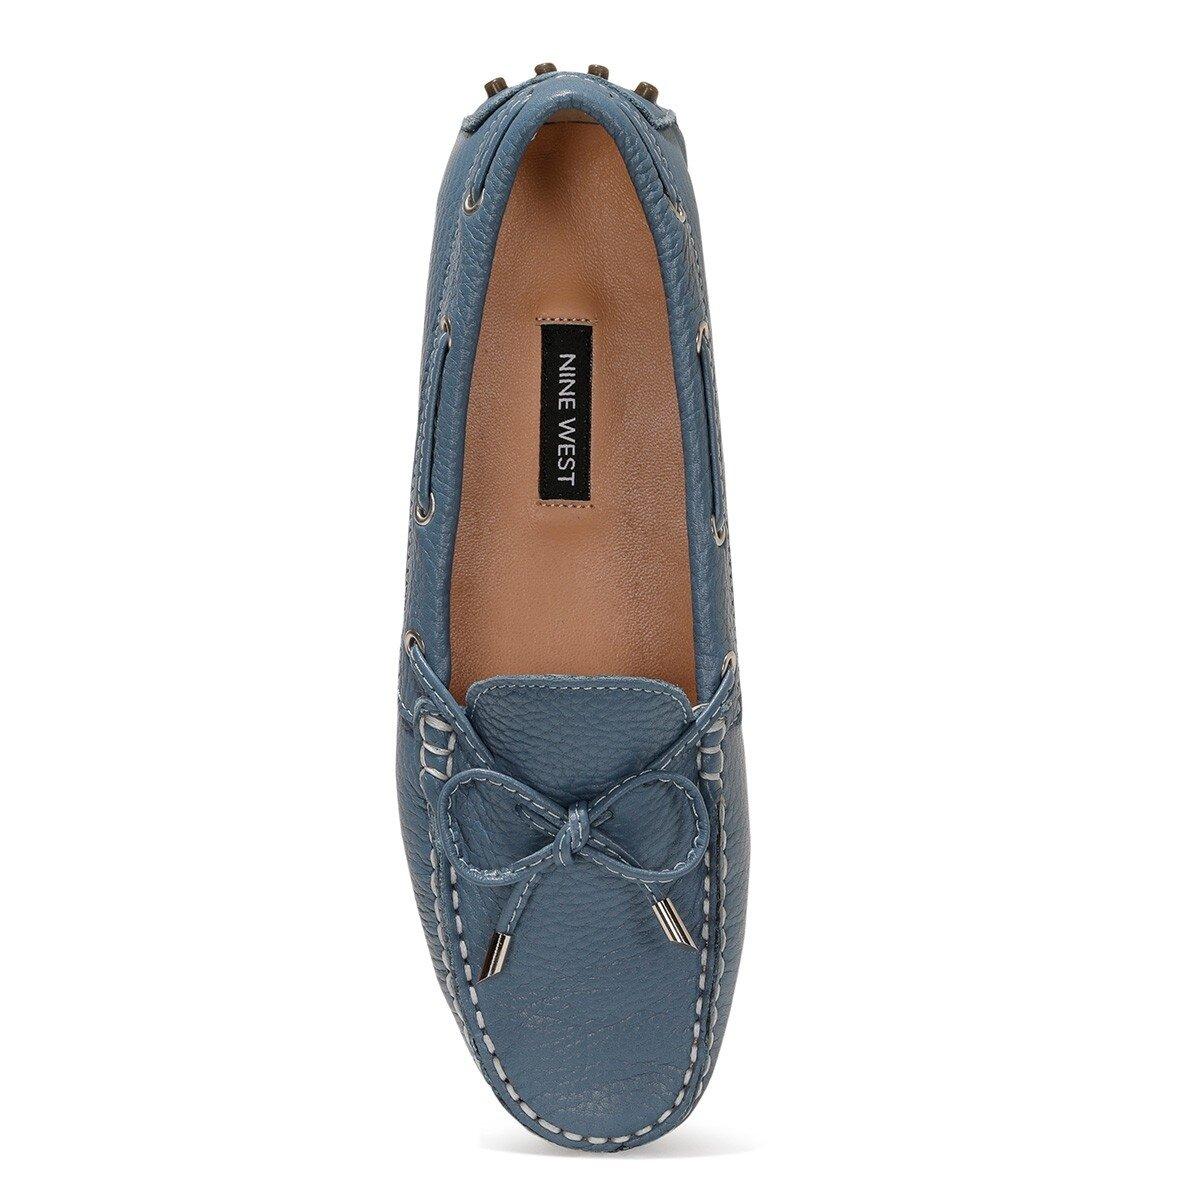 HOLT Mavi Kadın Loafer